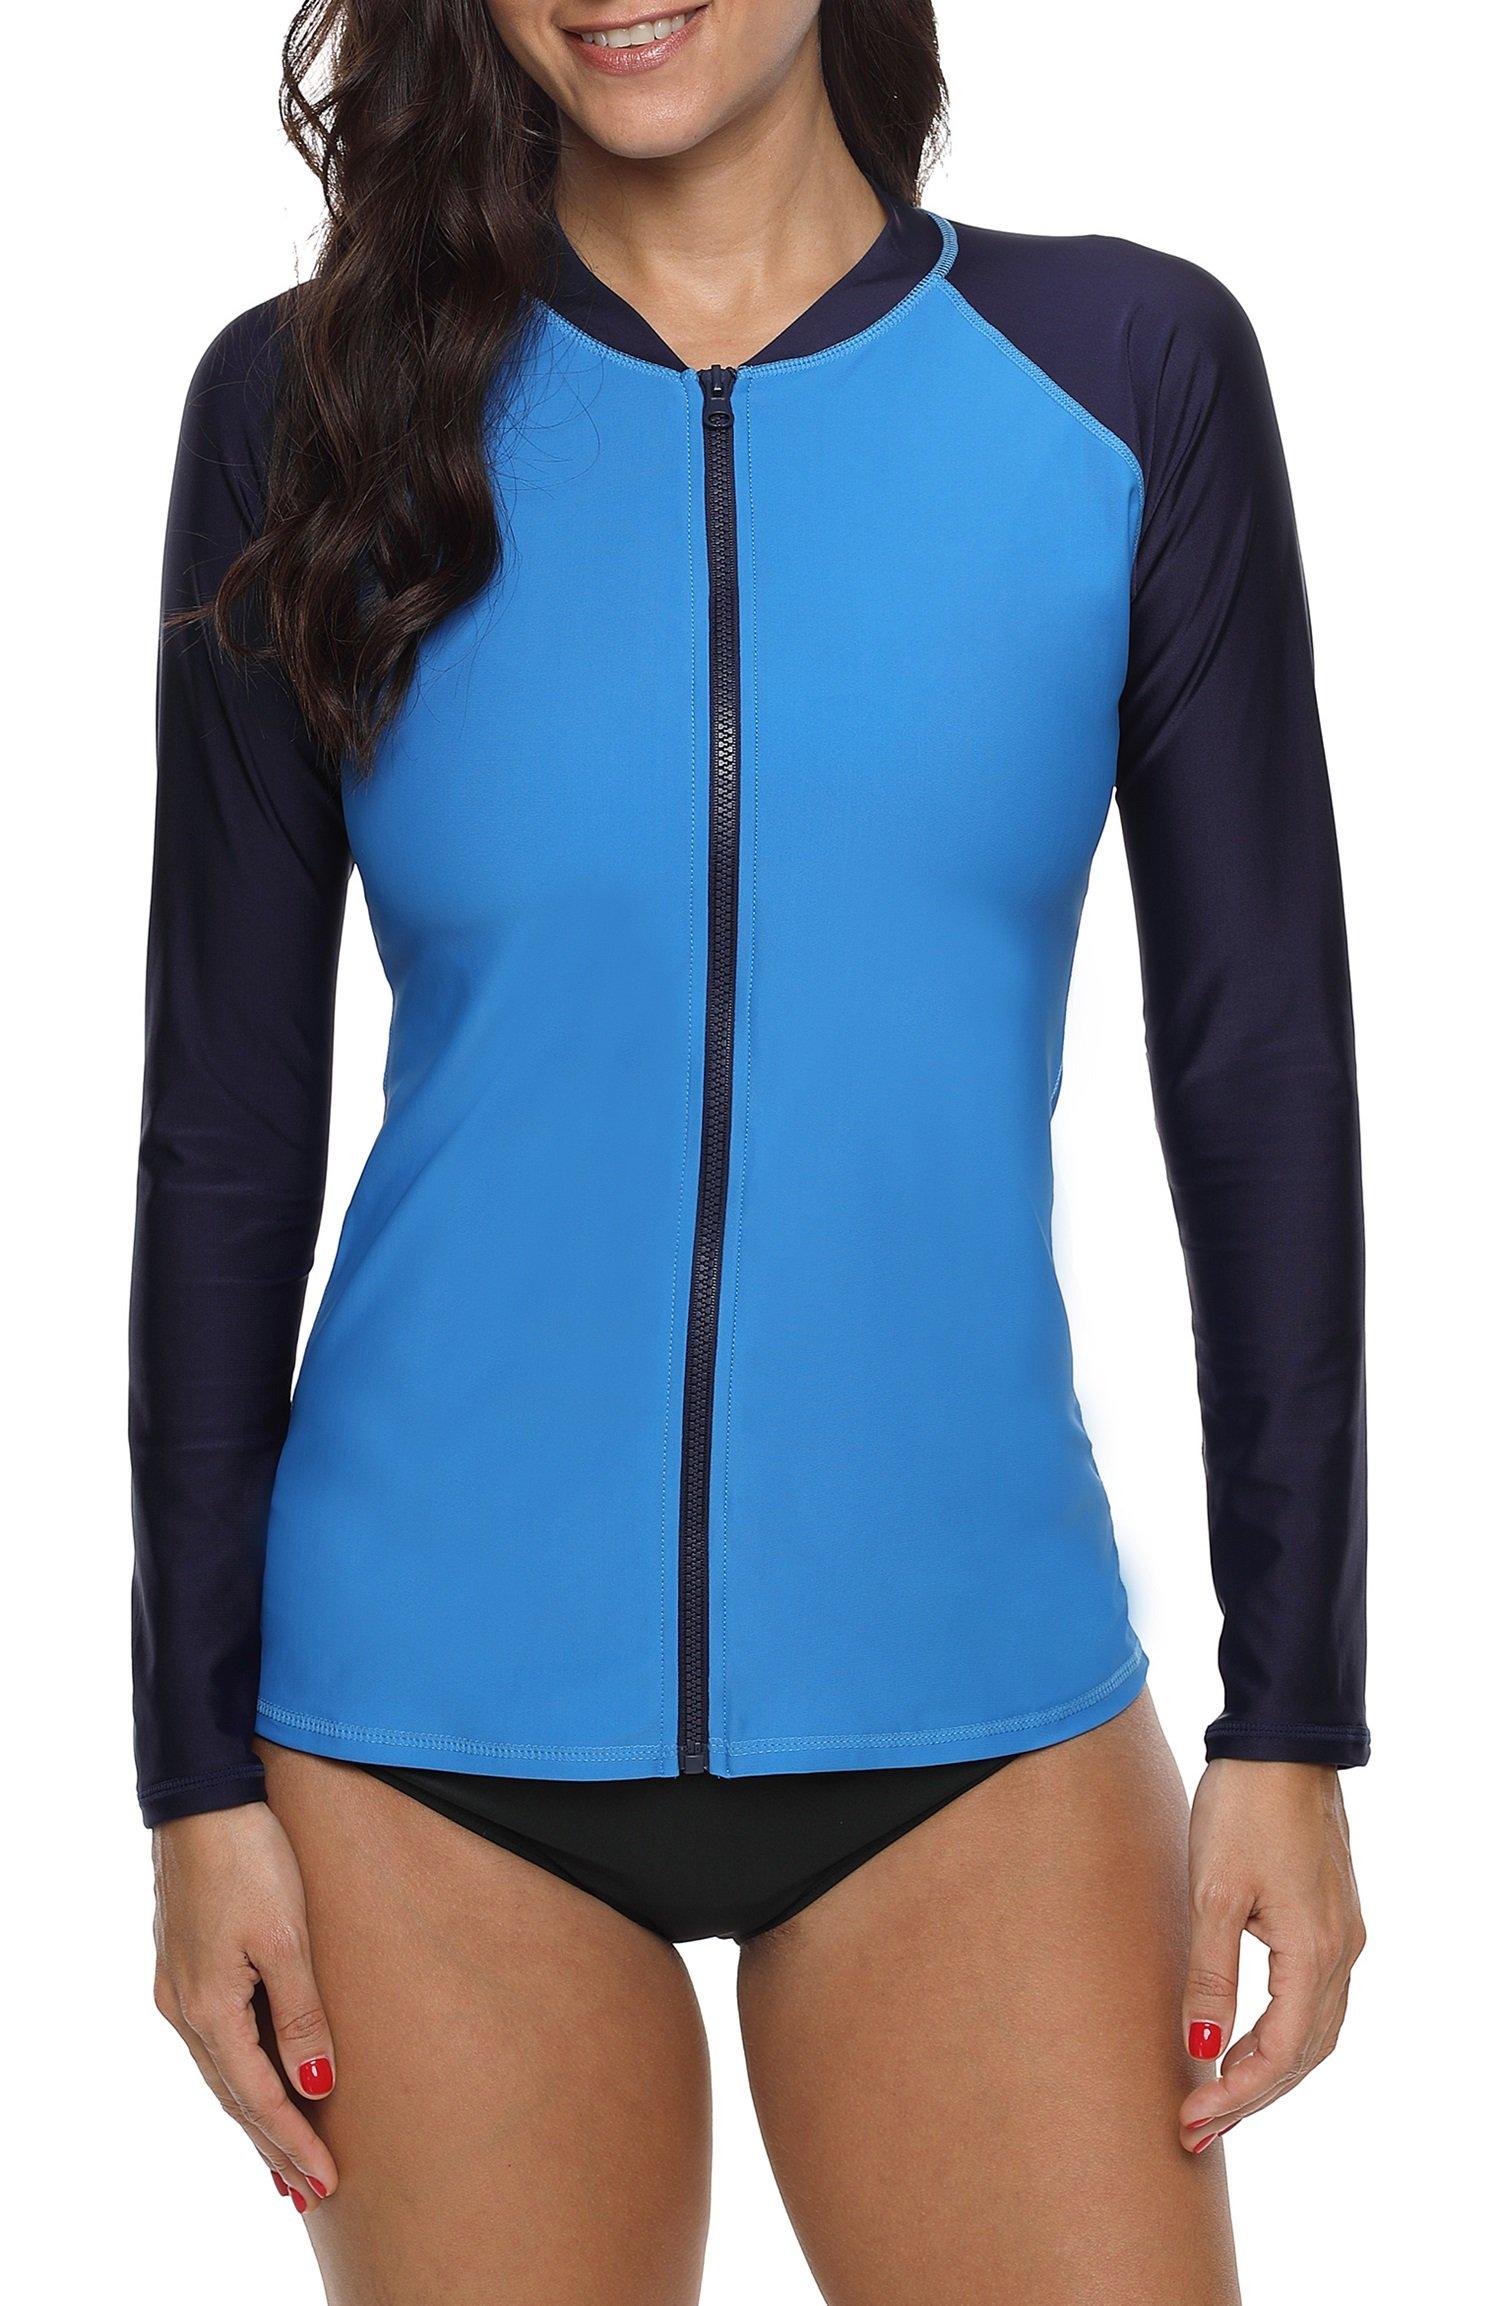 ATTRACO Womens Rashguard Shirt Long Raglan Sleeve Zip Front Surf Shirt Royal Large by ATTRACO